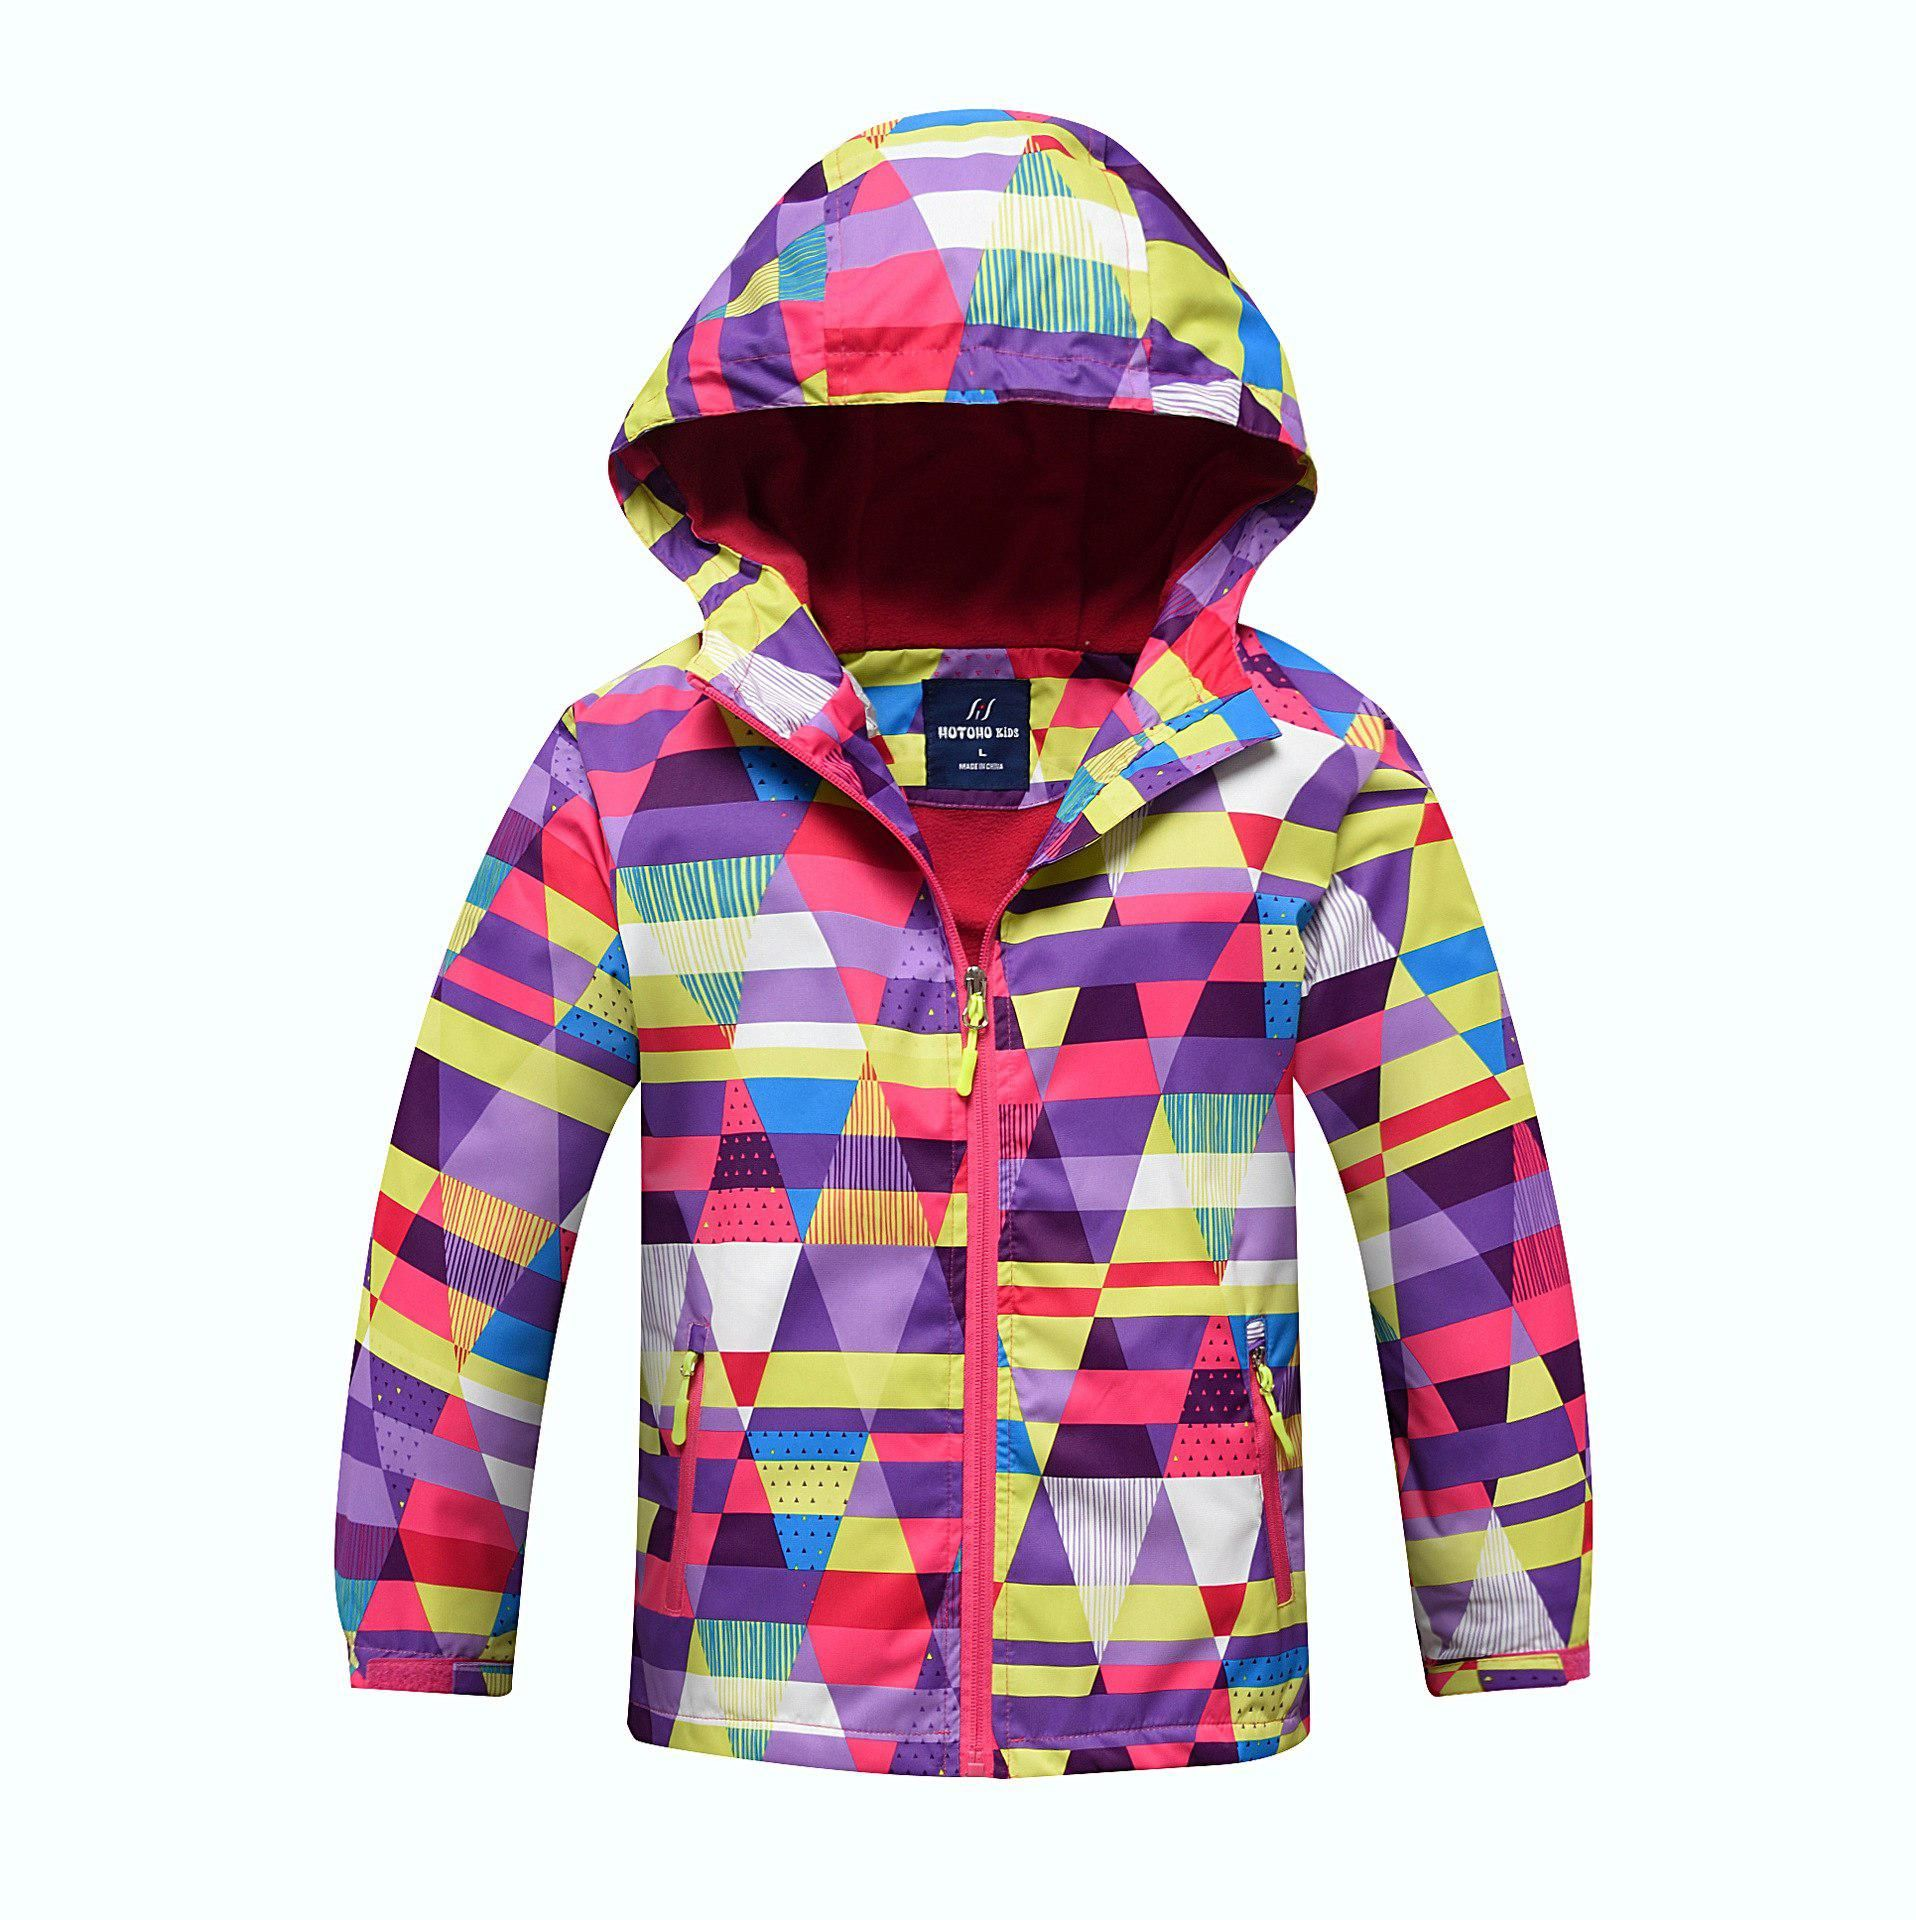 81170fe15c37 HUTUHU 2018 Children Winter Spring Jacket Boys girls Hoodies ...